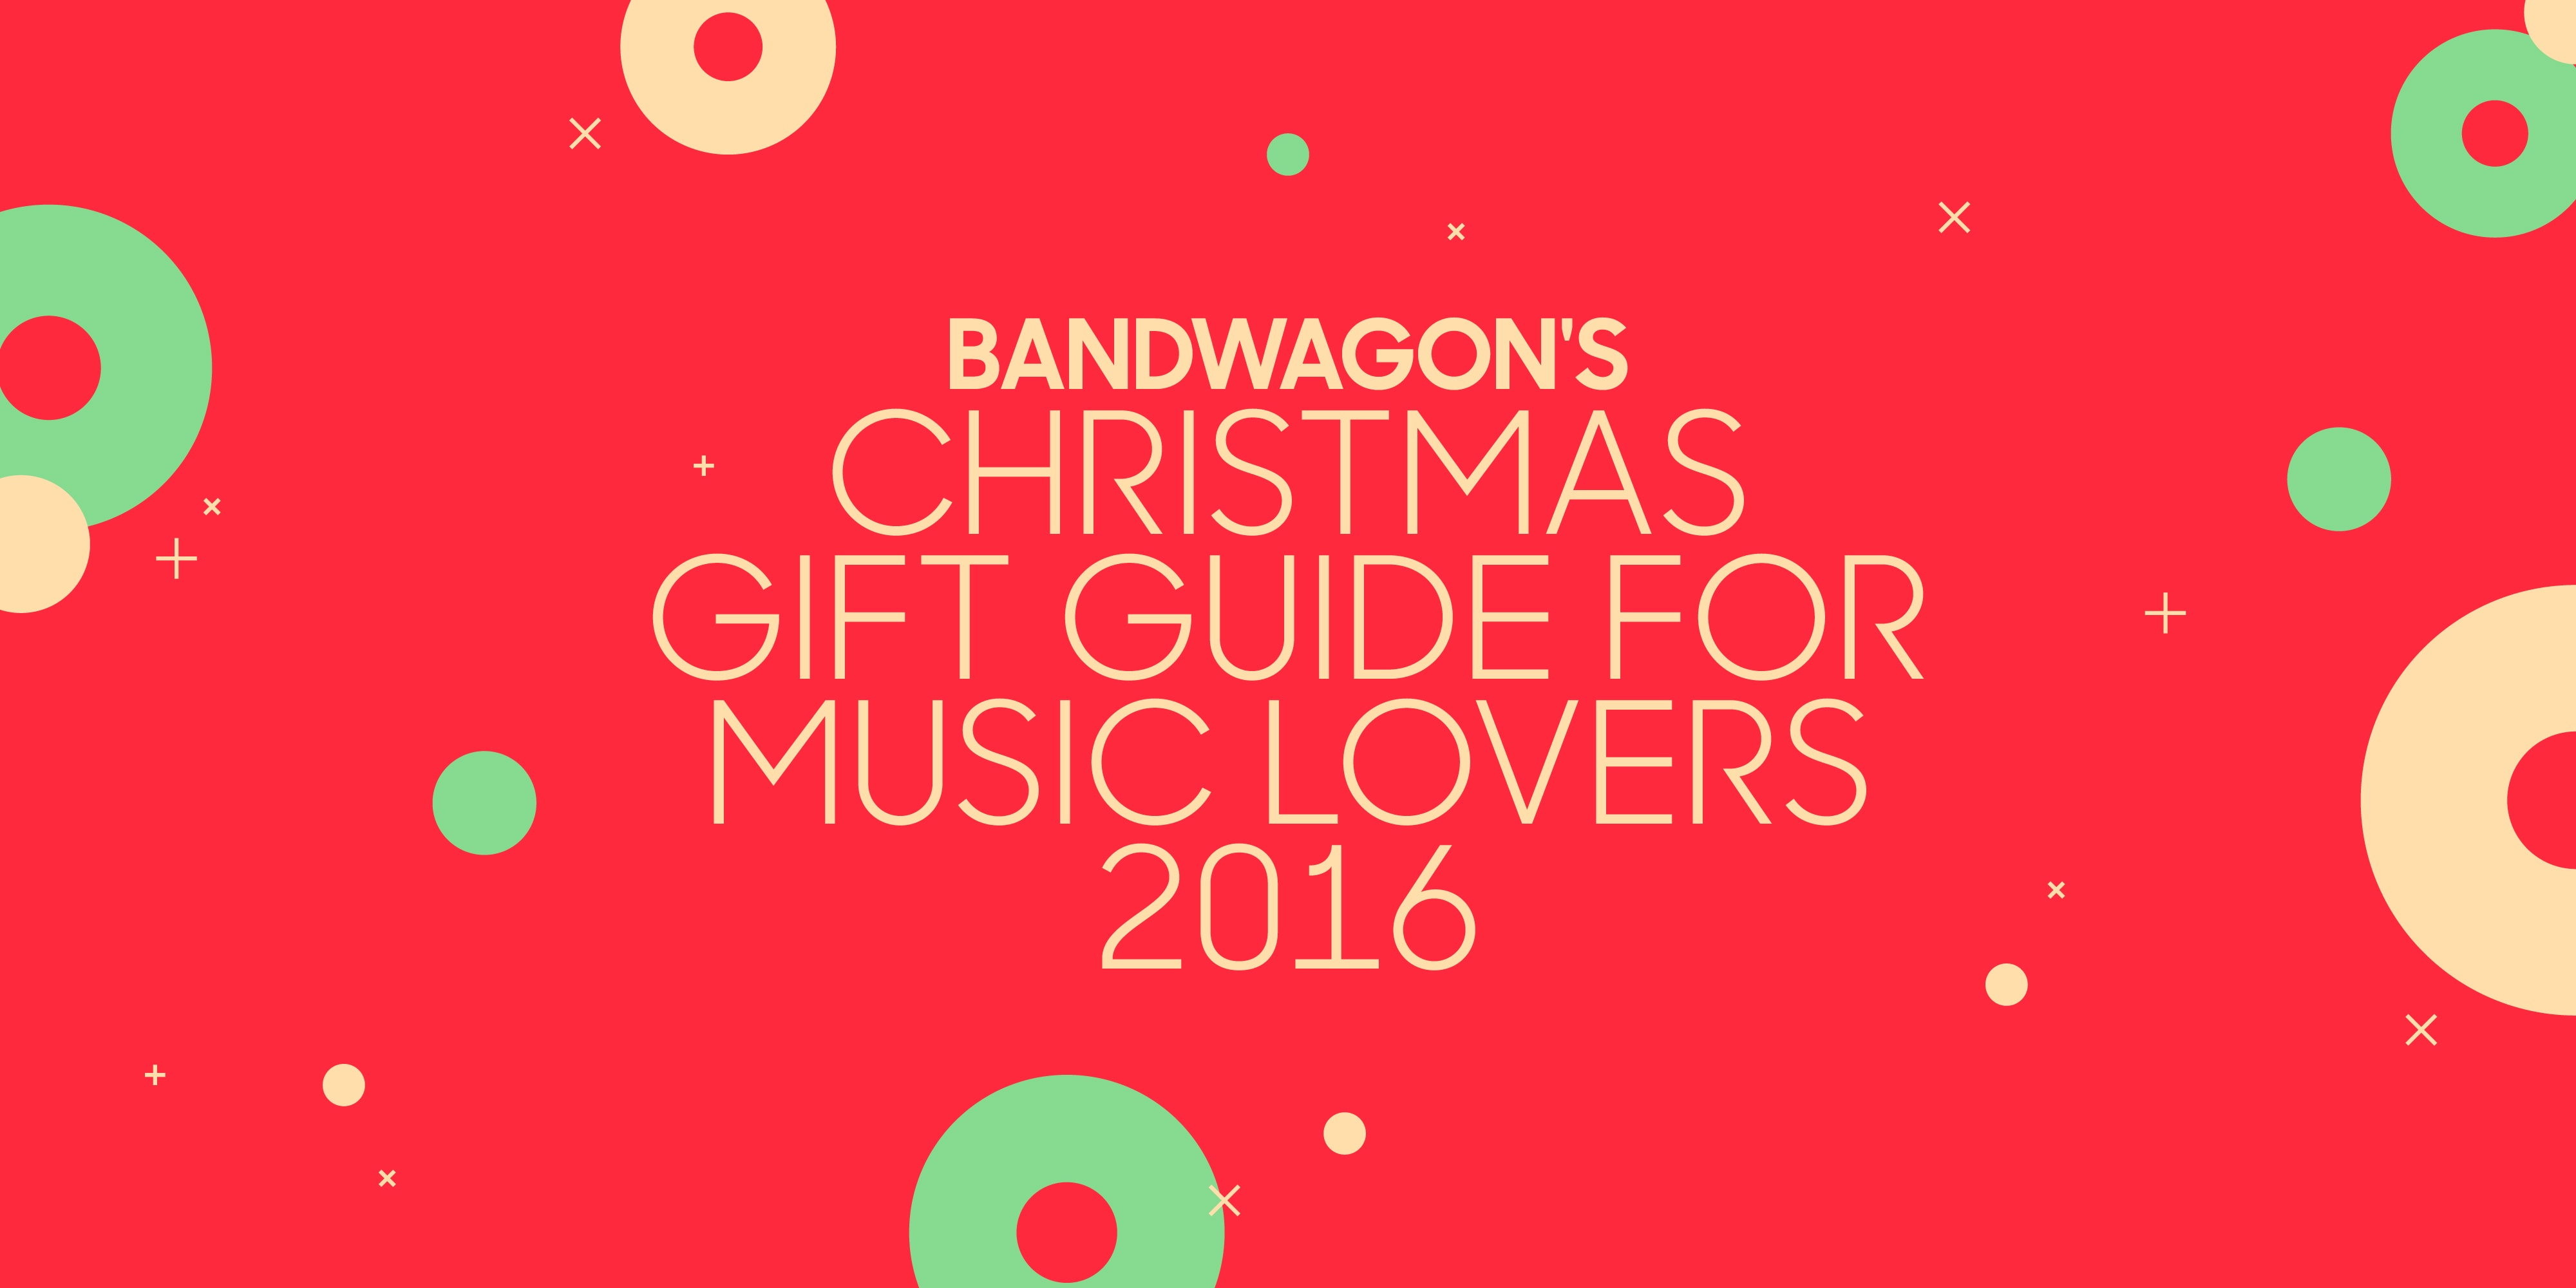 Bandwagon's Christmas Gift Guide For Music Lovers 2016